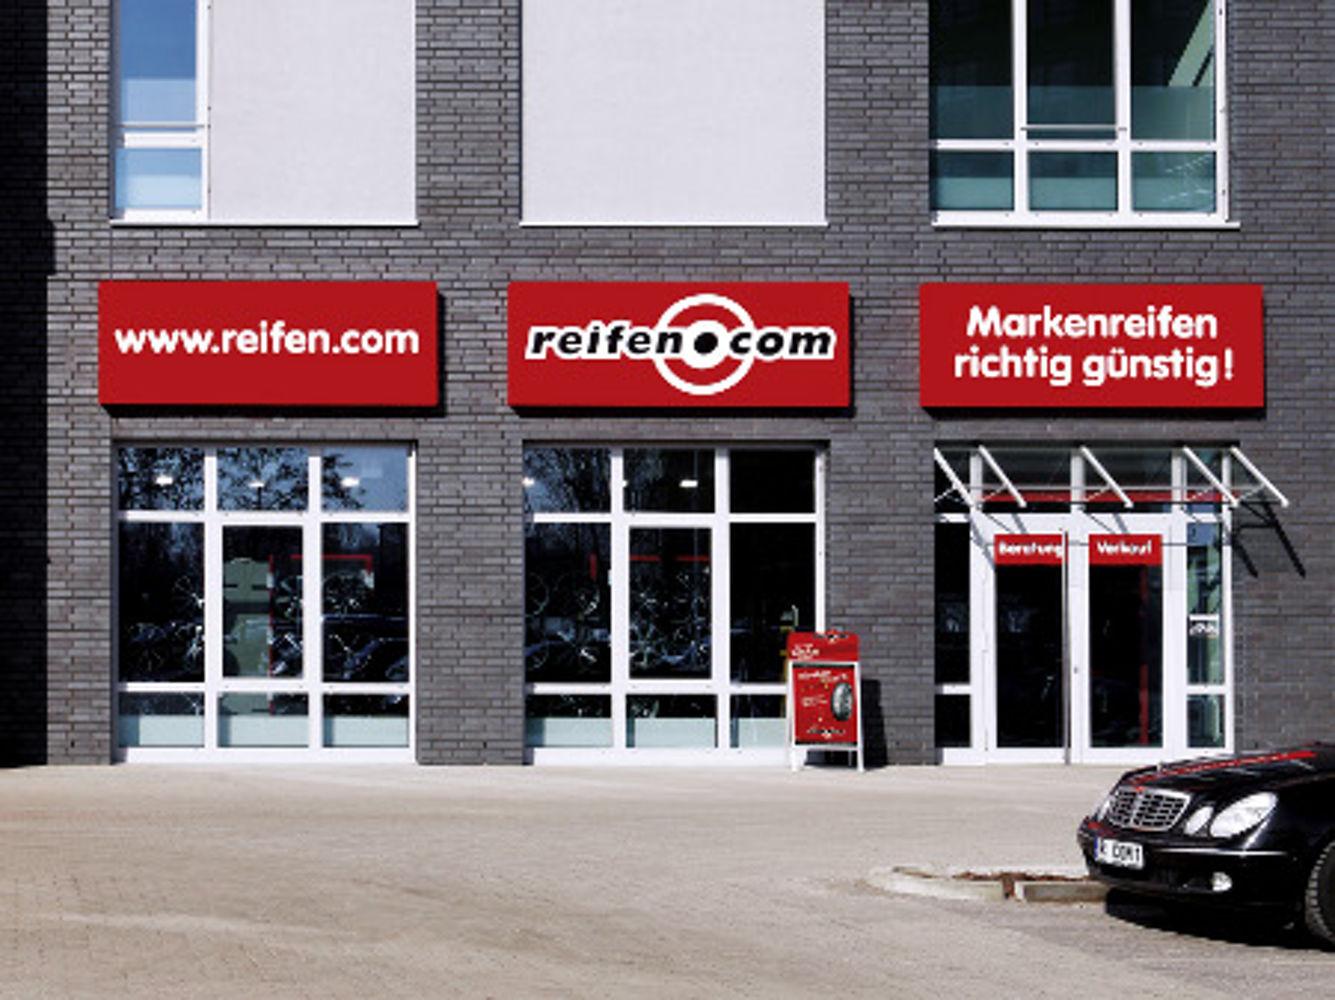 reifen.com-Filiale  in Hannover Vahrenheide